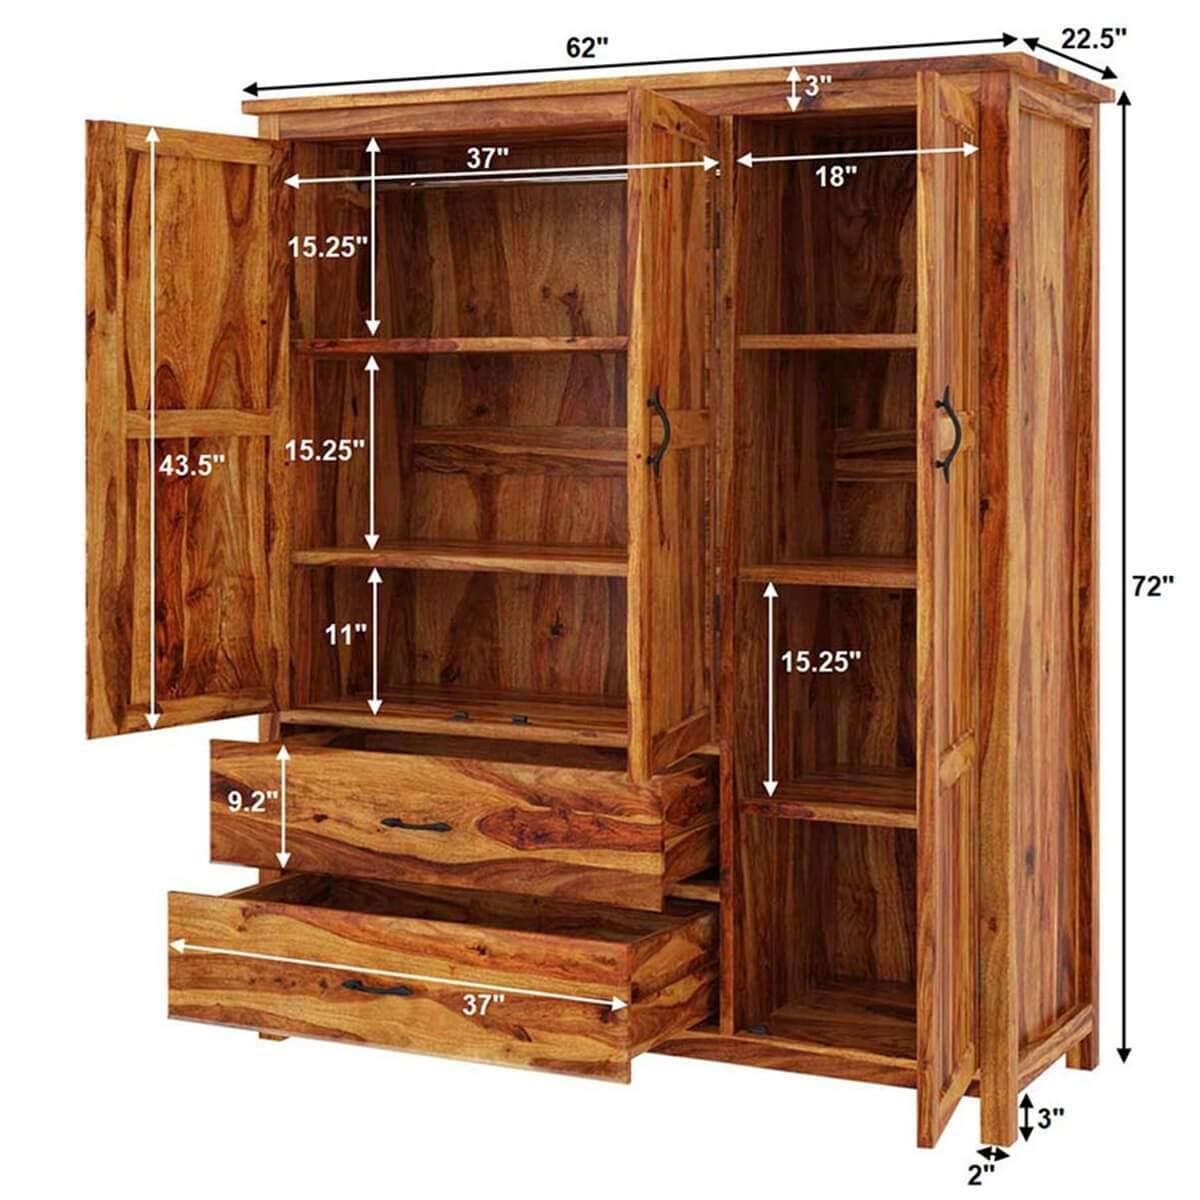 Sheffield Rustic Solid Wood Large Bedroom Wardrobe Armoire ...